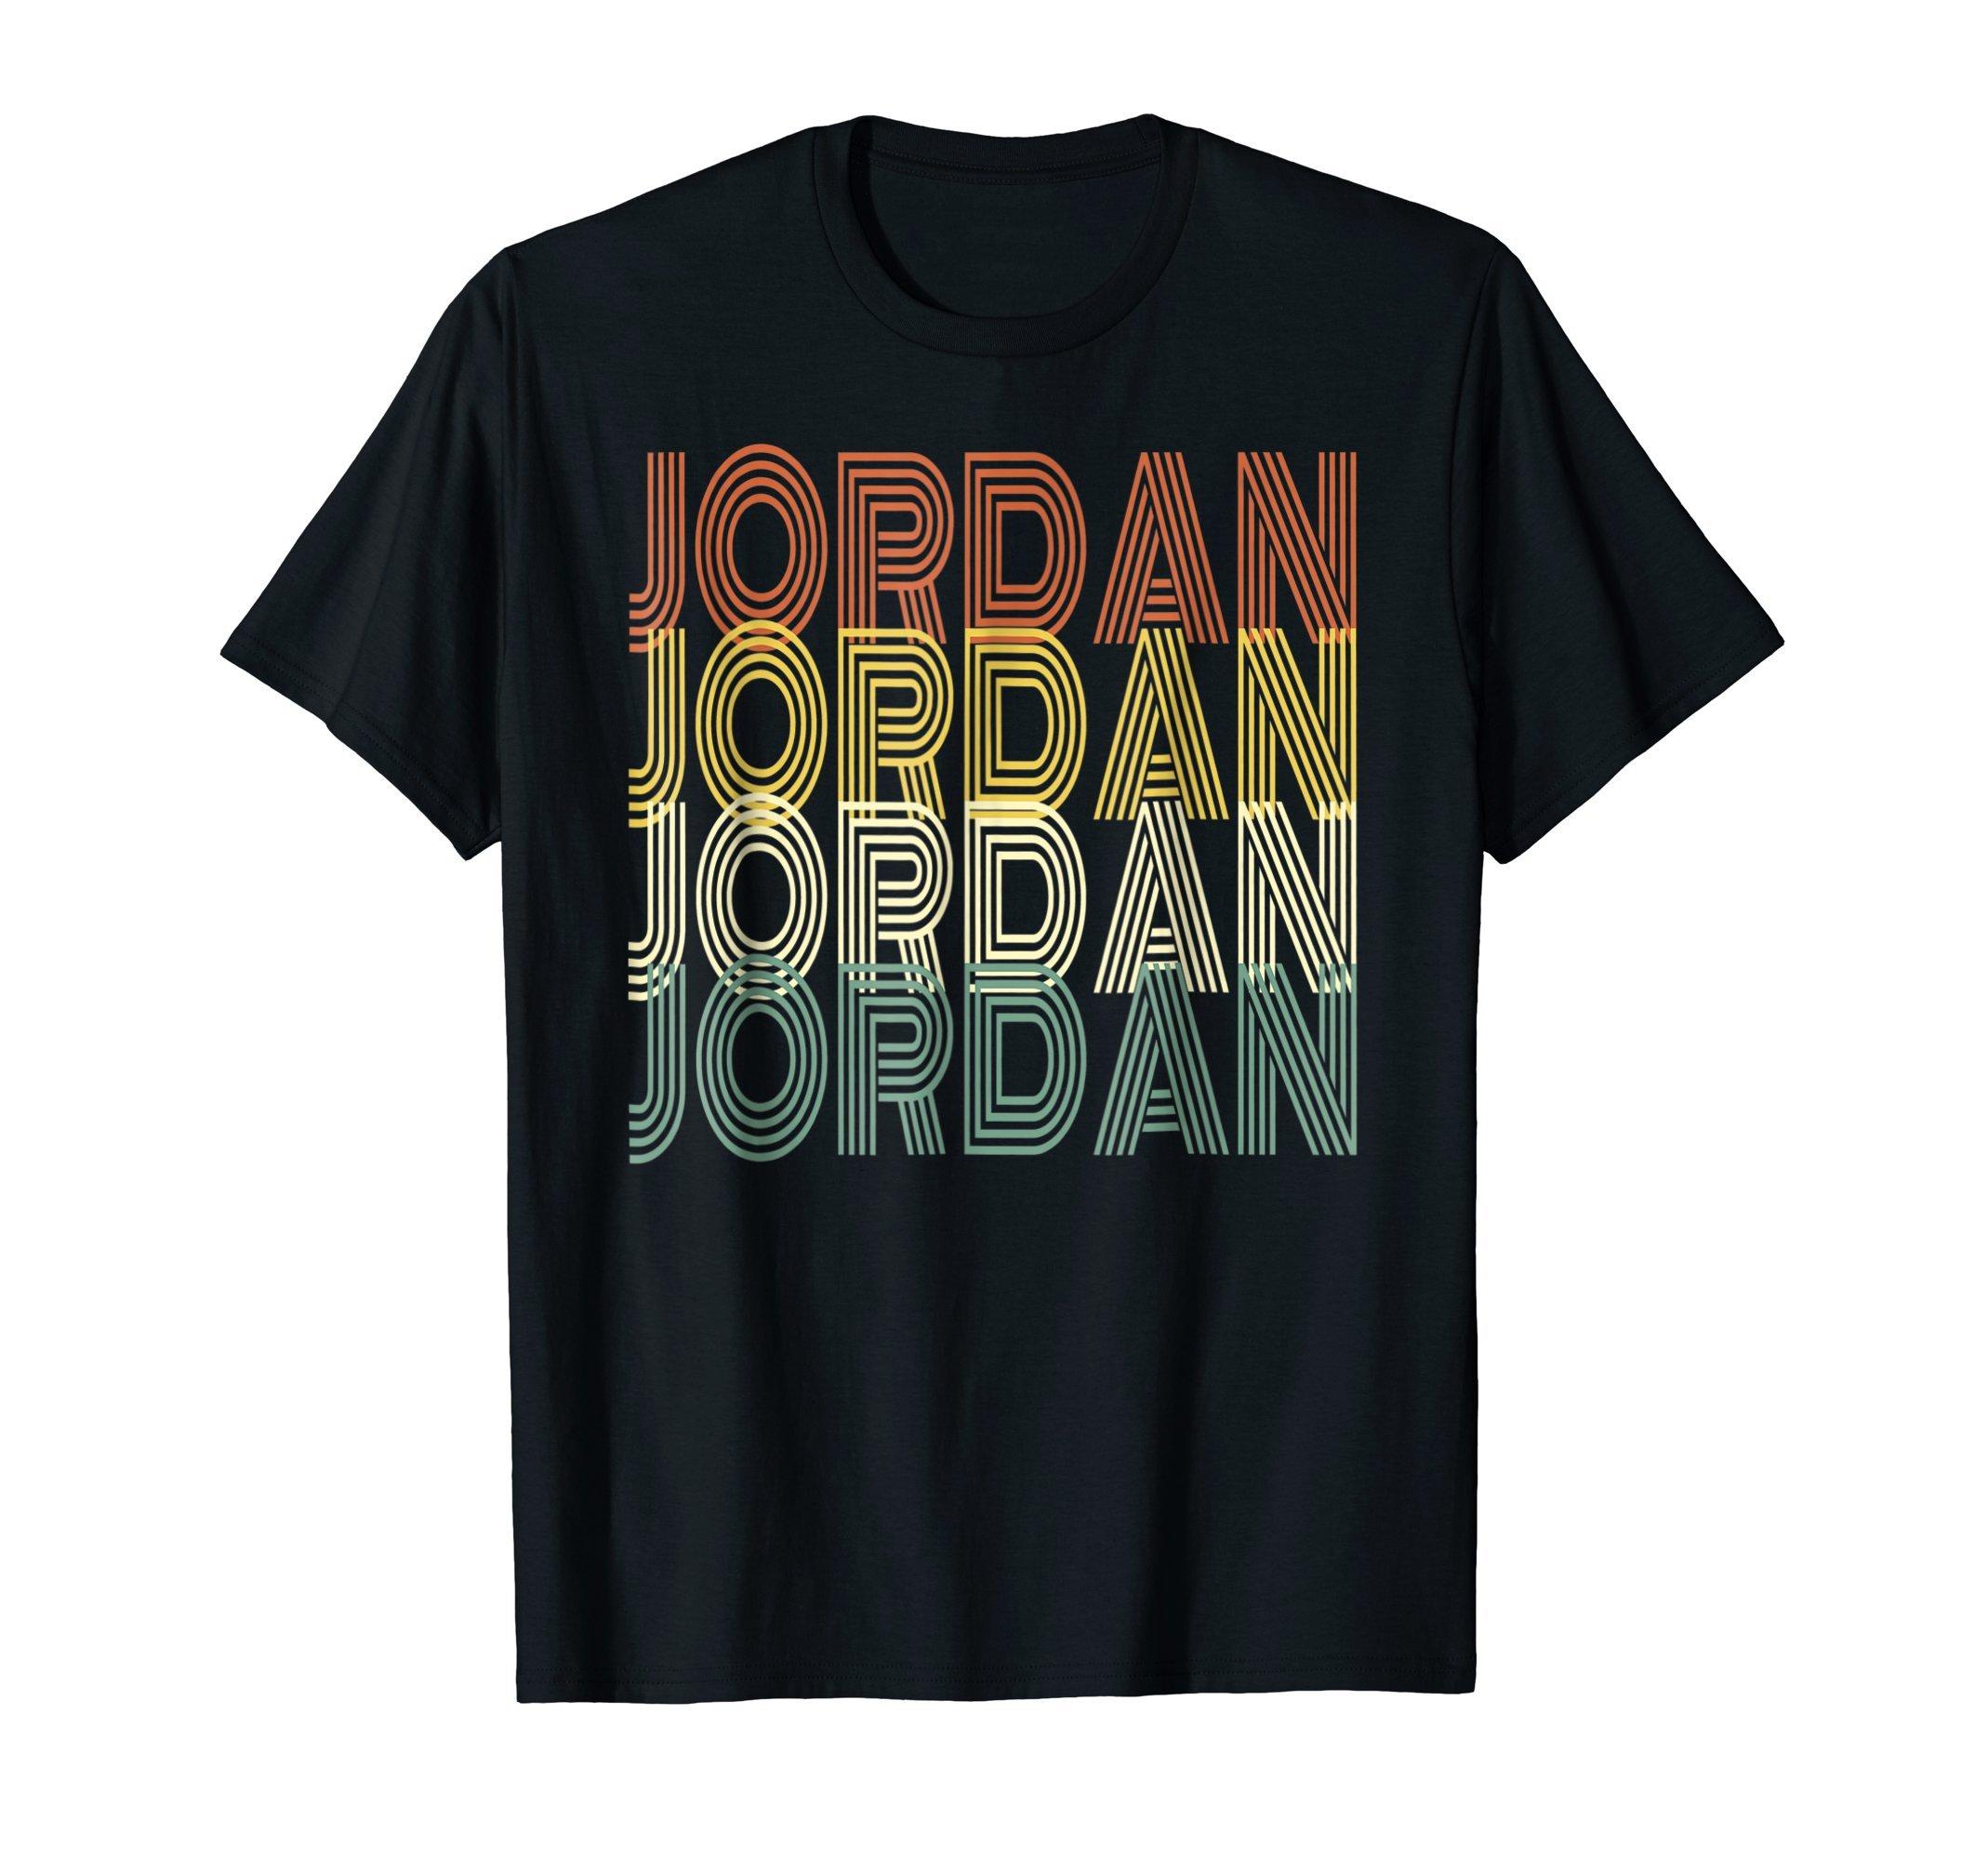 Jordan Vintage 1980s Style Retro Jordan T-Shirt